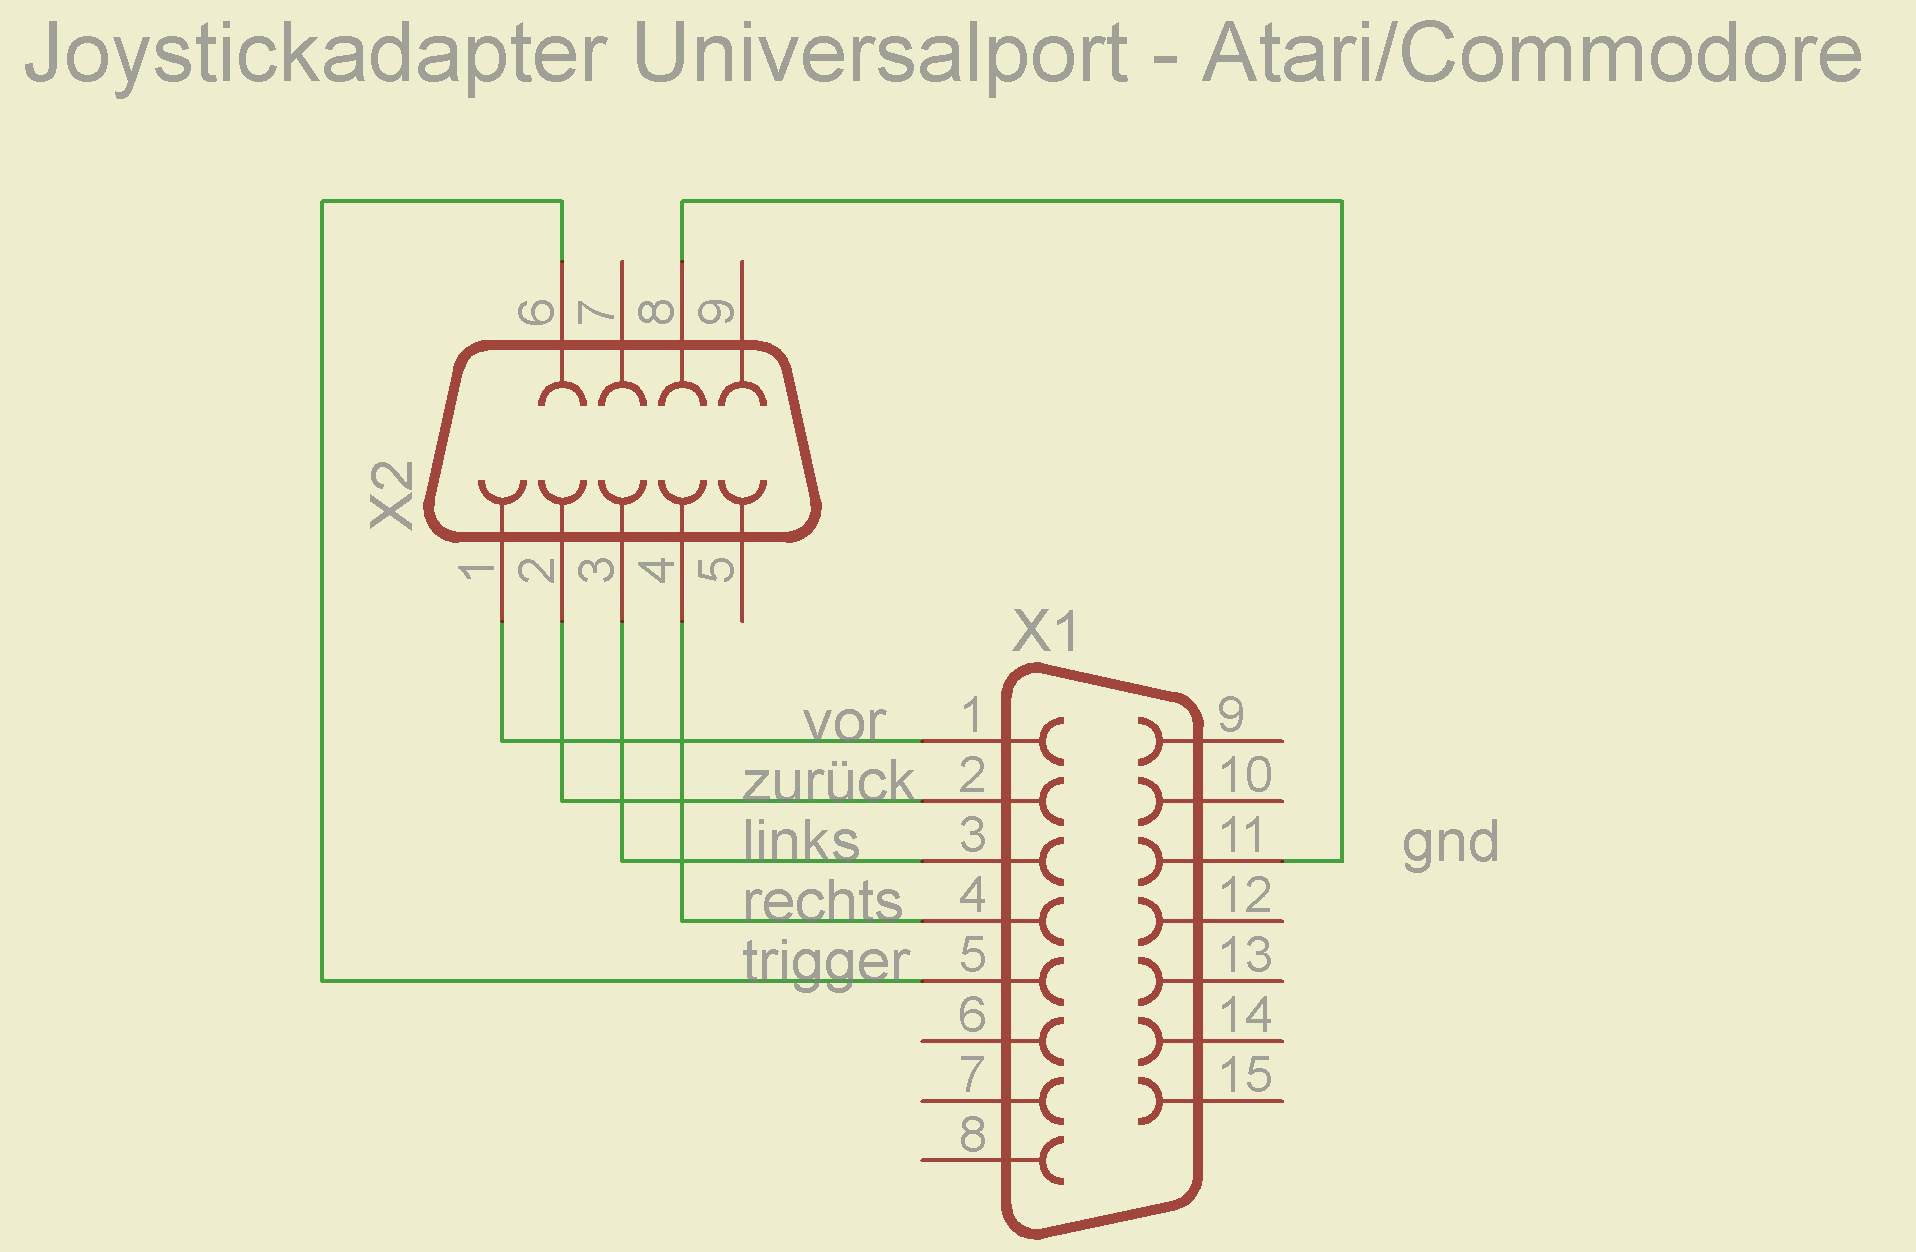 joystick-adapter